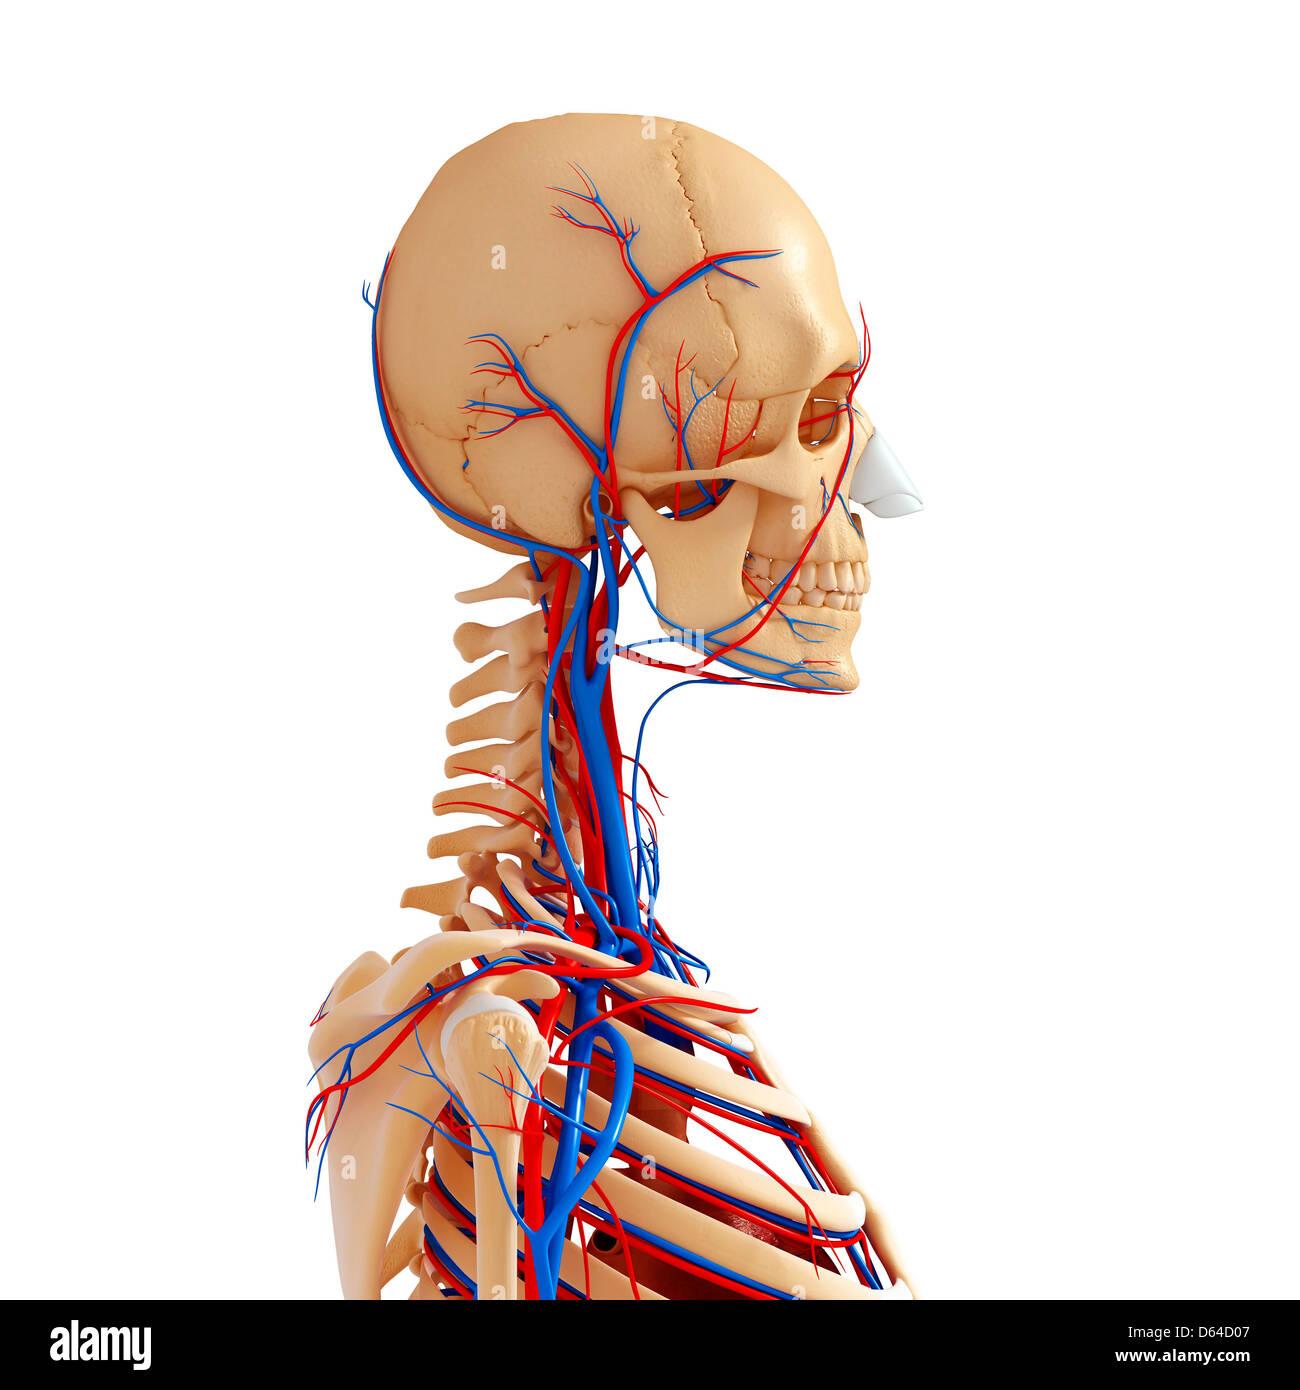 Oberkörper-Anatomie, artwork Stockfoto, Bild: 55417047 - Alamy